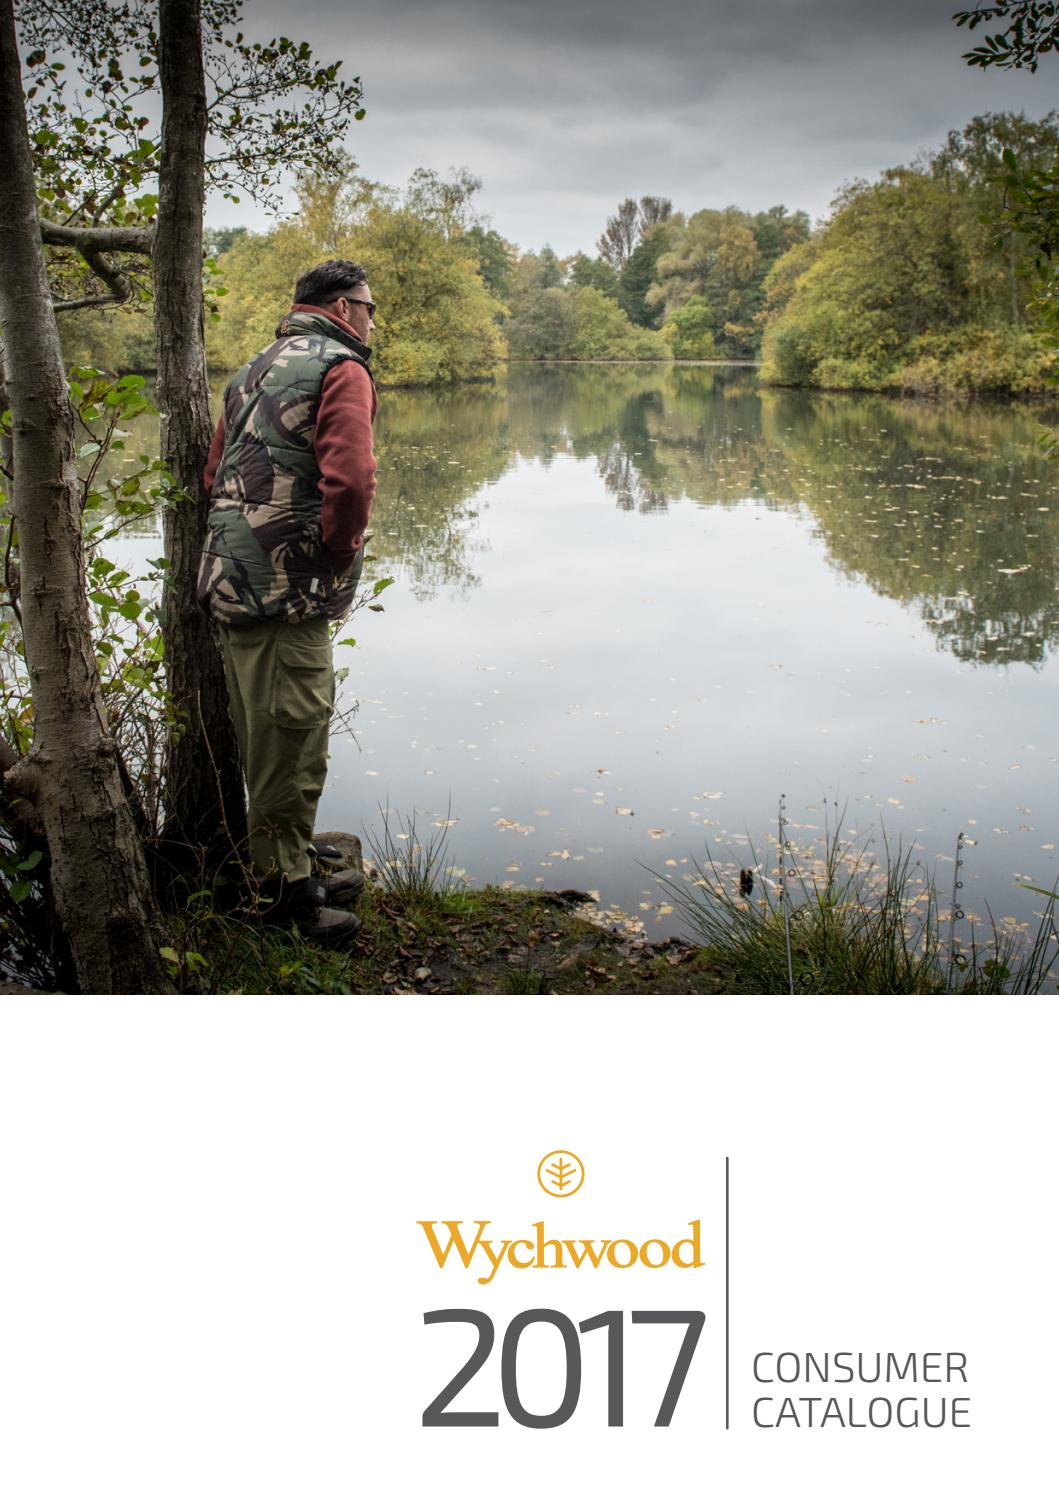 BRAND NEW WYCHWOOD THE SLUG BOBBIN CHAIN INDICATOR IN YELLOW FOR CARP FISHING